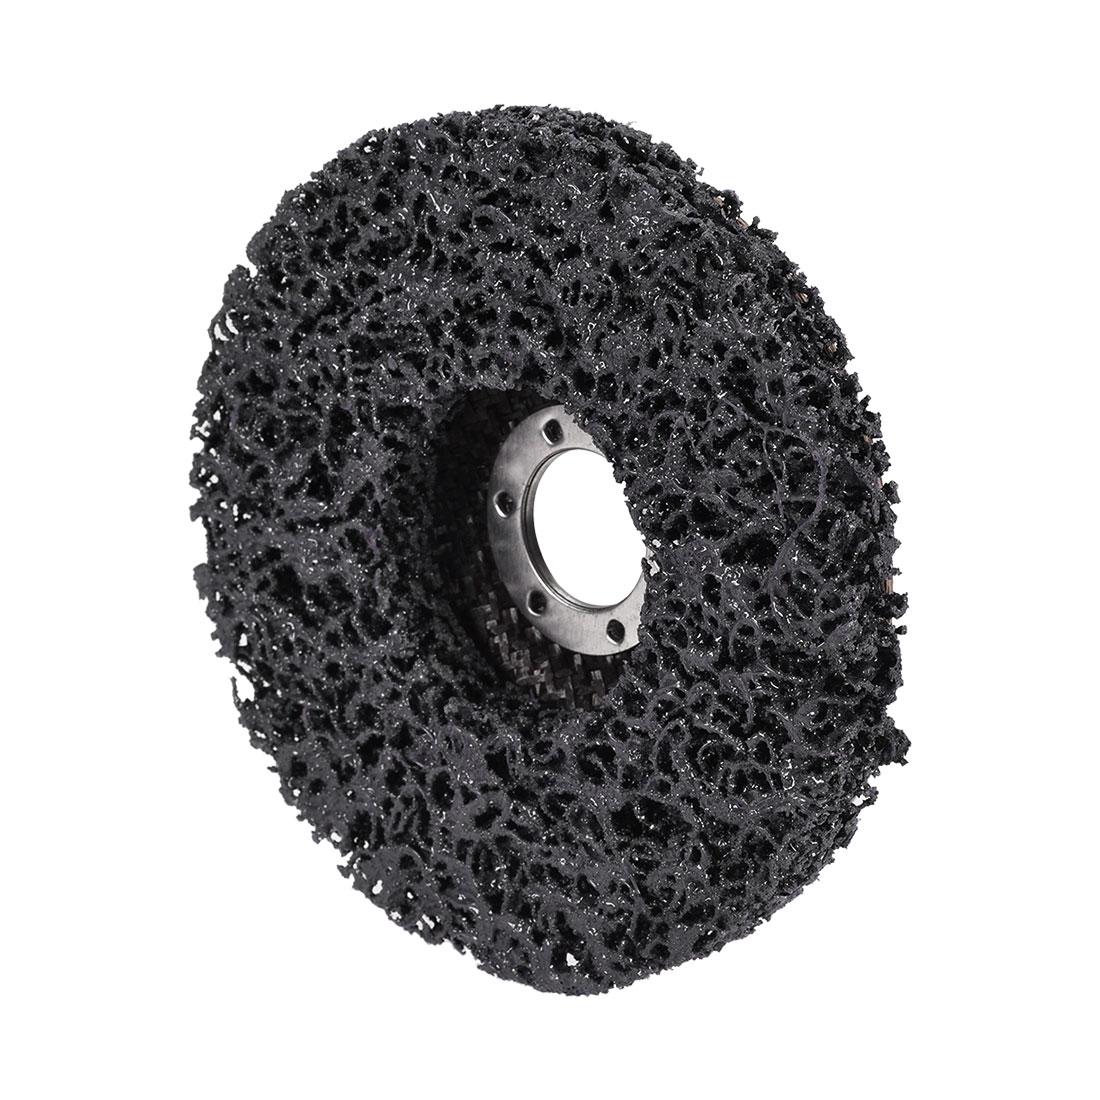 5 Inch Nylon Polishing Wheel Buffing Pad Felt Disc Black